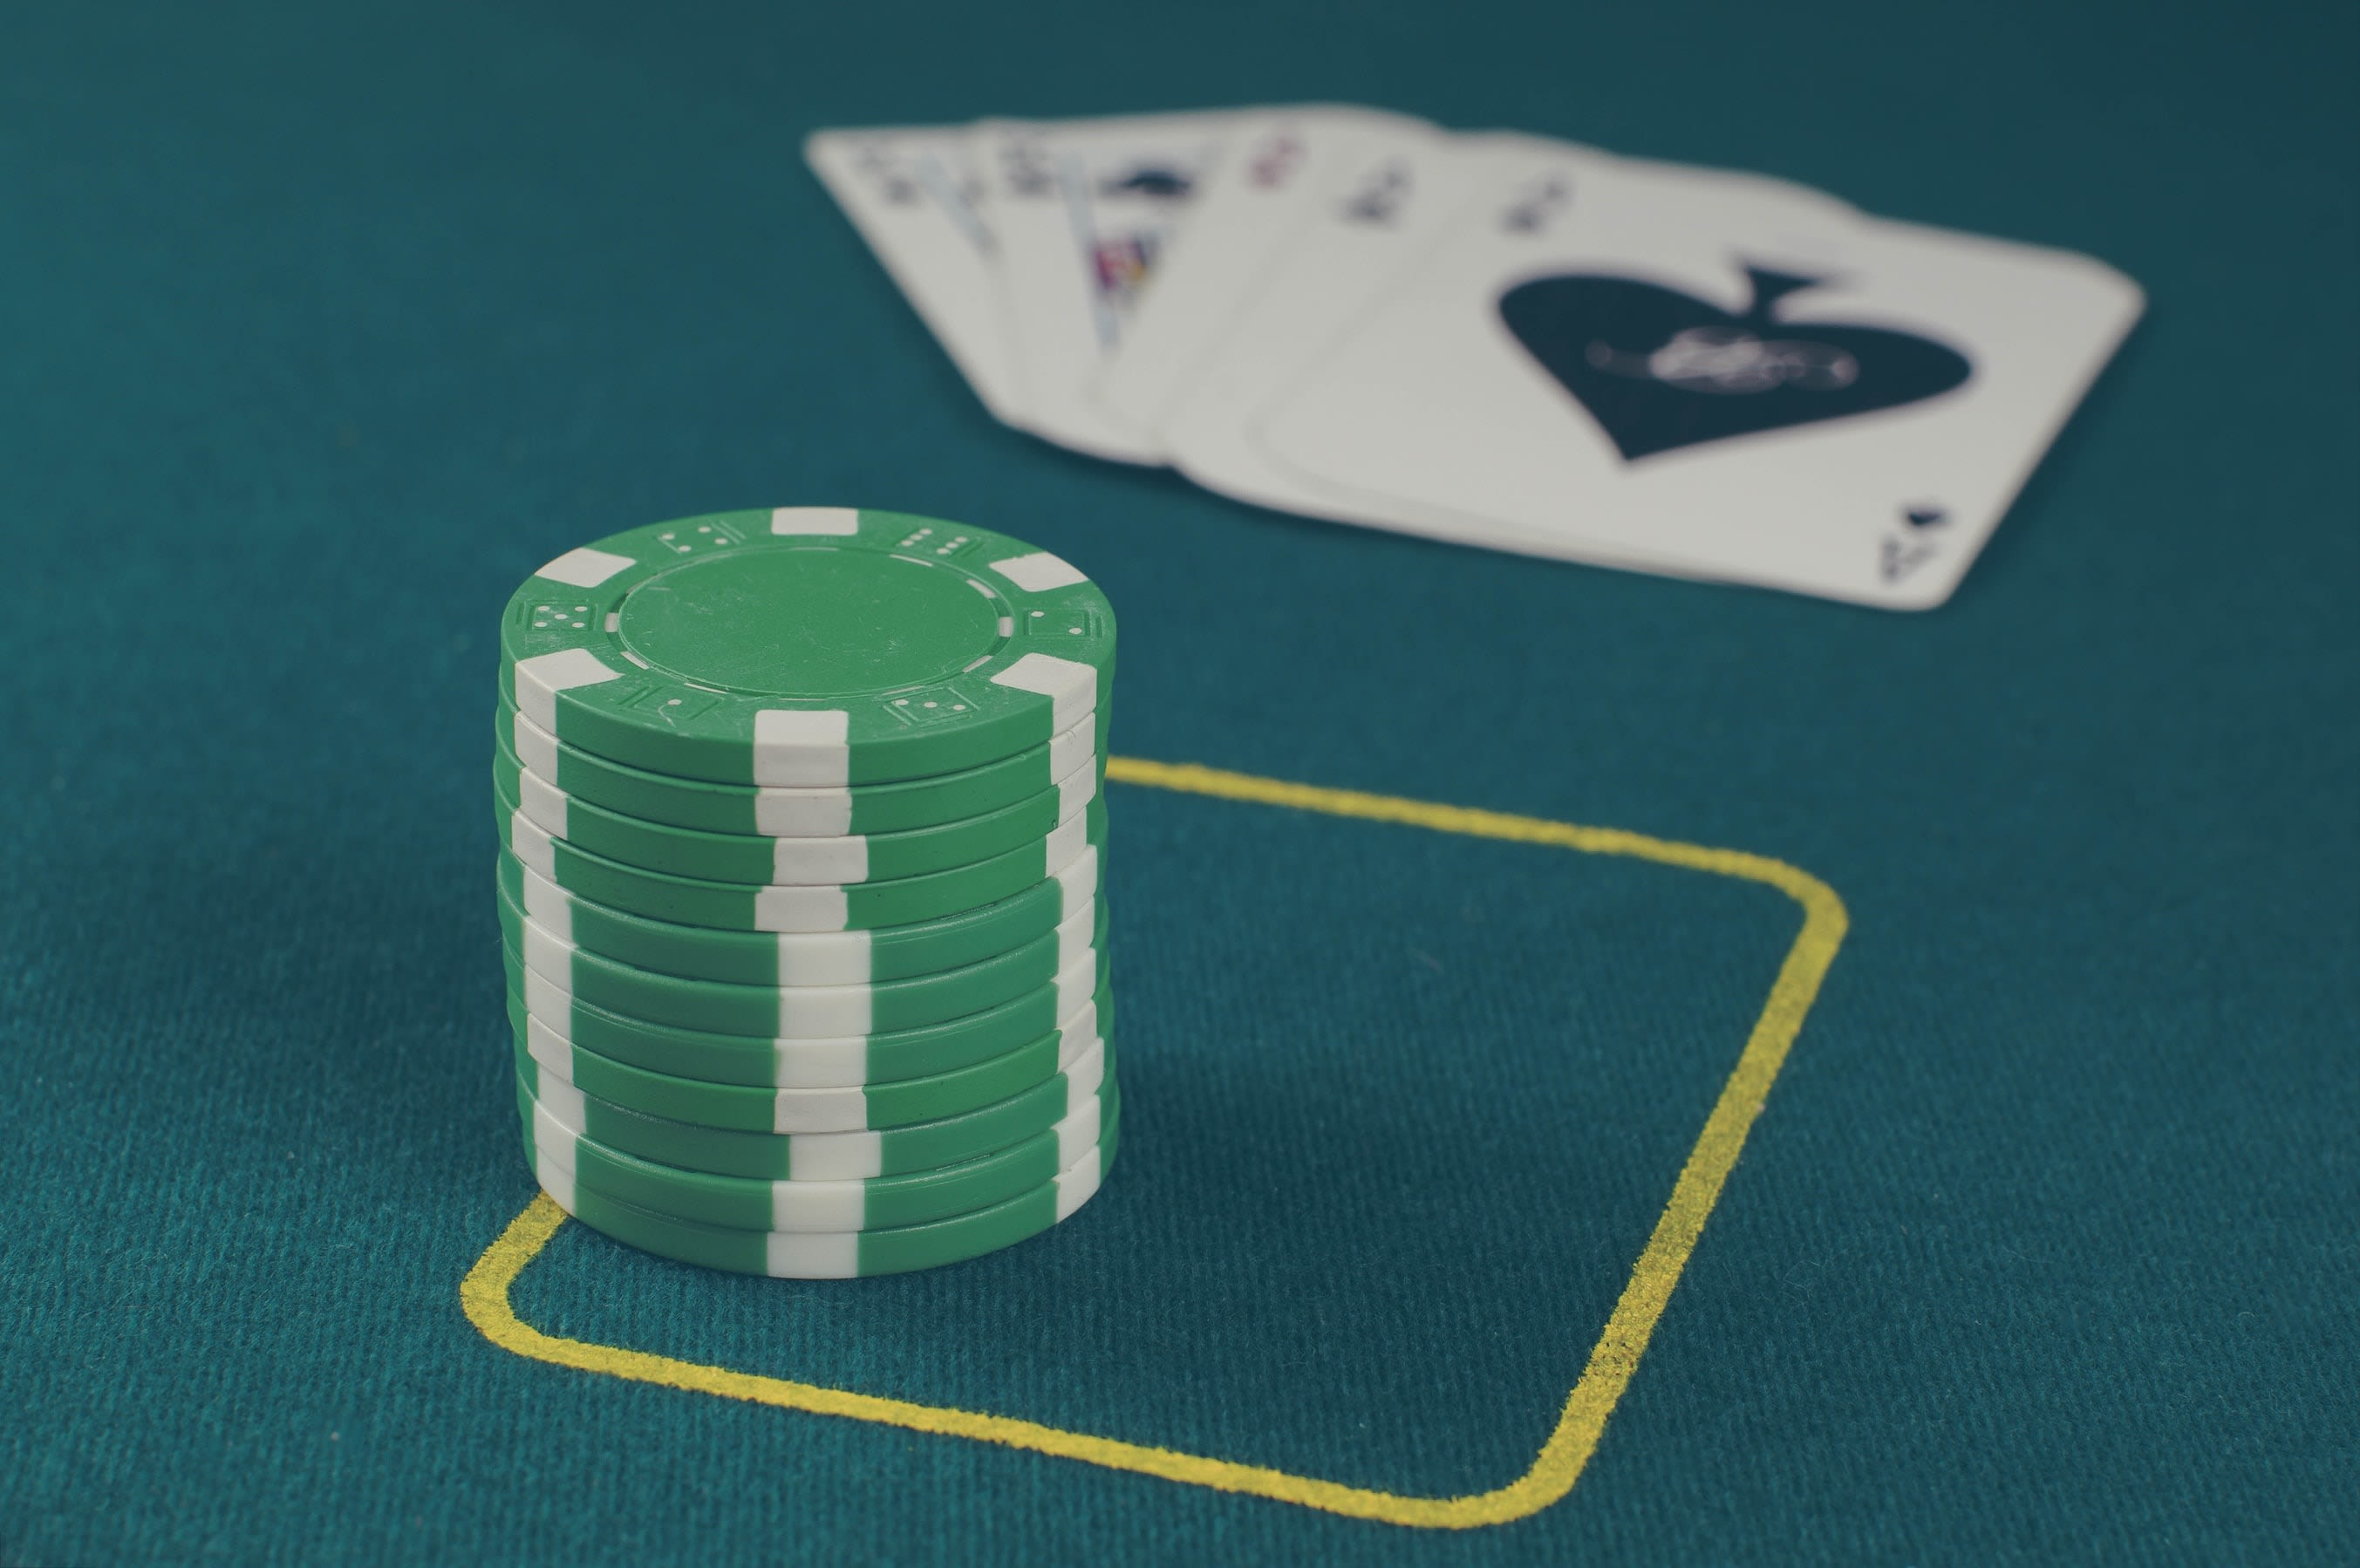 """Texas Hold'em Online"": mokytis pagrindų"